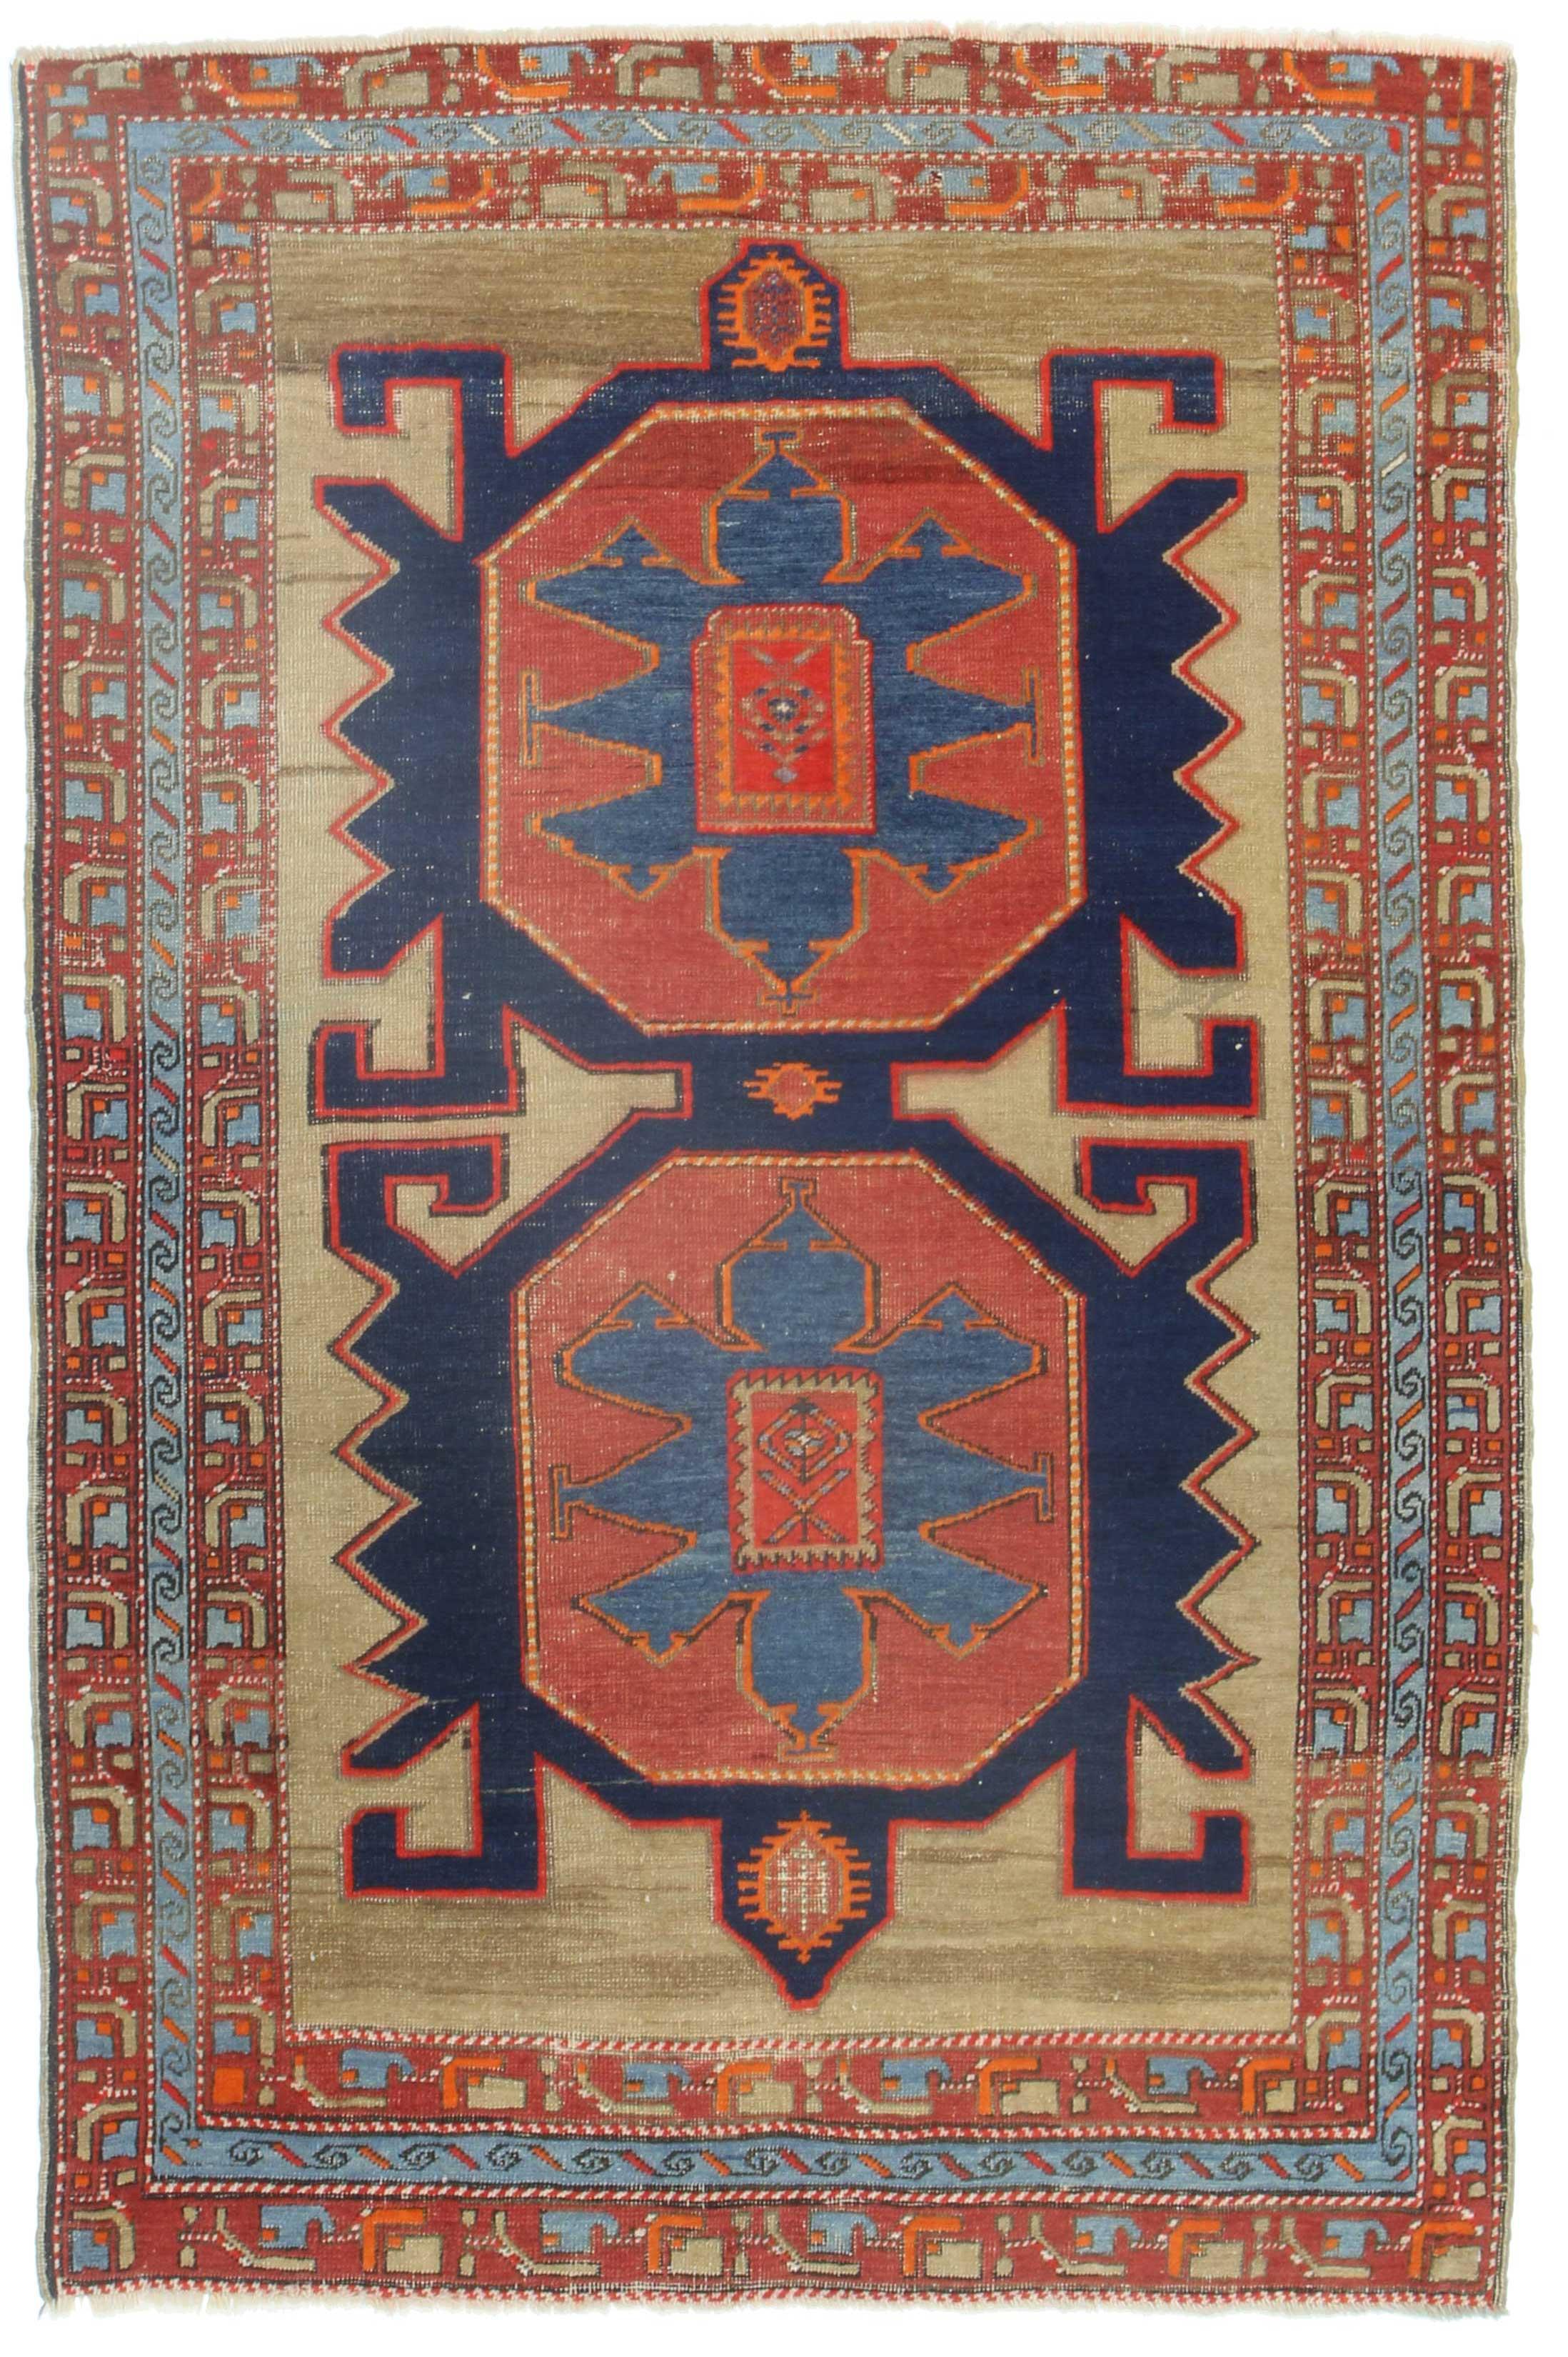 4 x 6 antique russian wool rug 14344 | exclusive oriental rugs